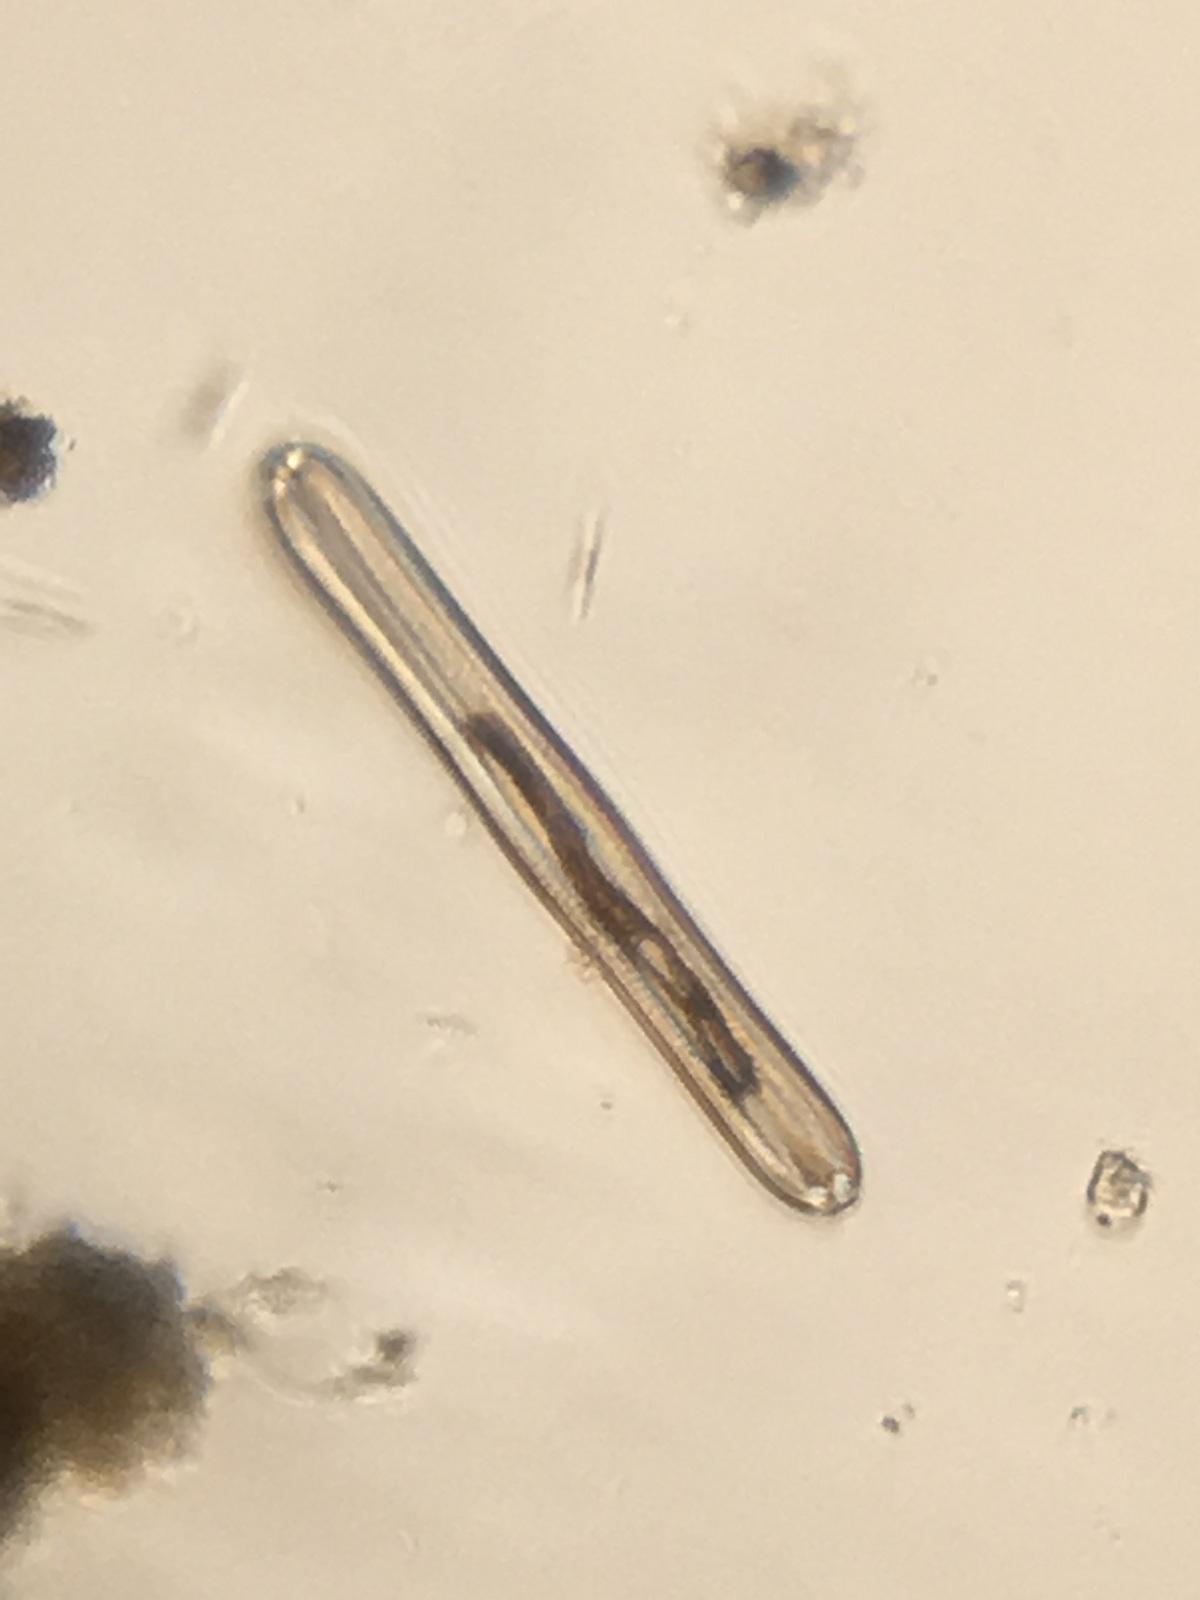 Pinnularia diatom by Damon Tighe using Foldscope